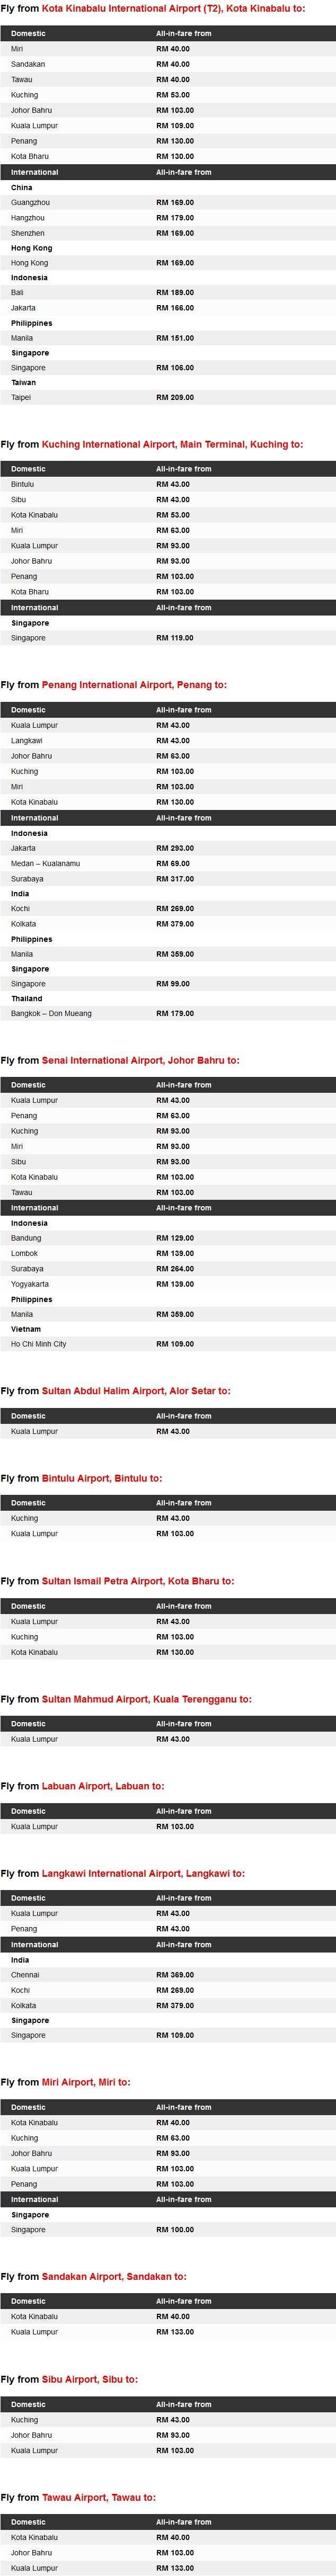 AirAsia Fly-Thru Low Fares Details